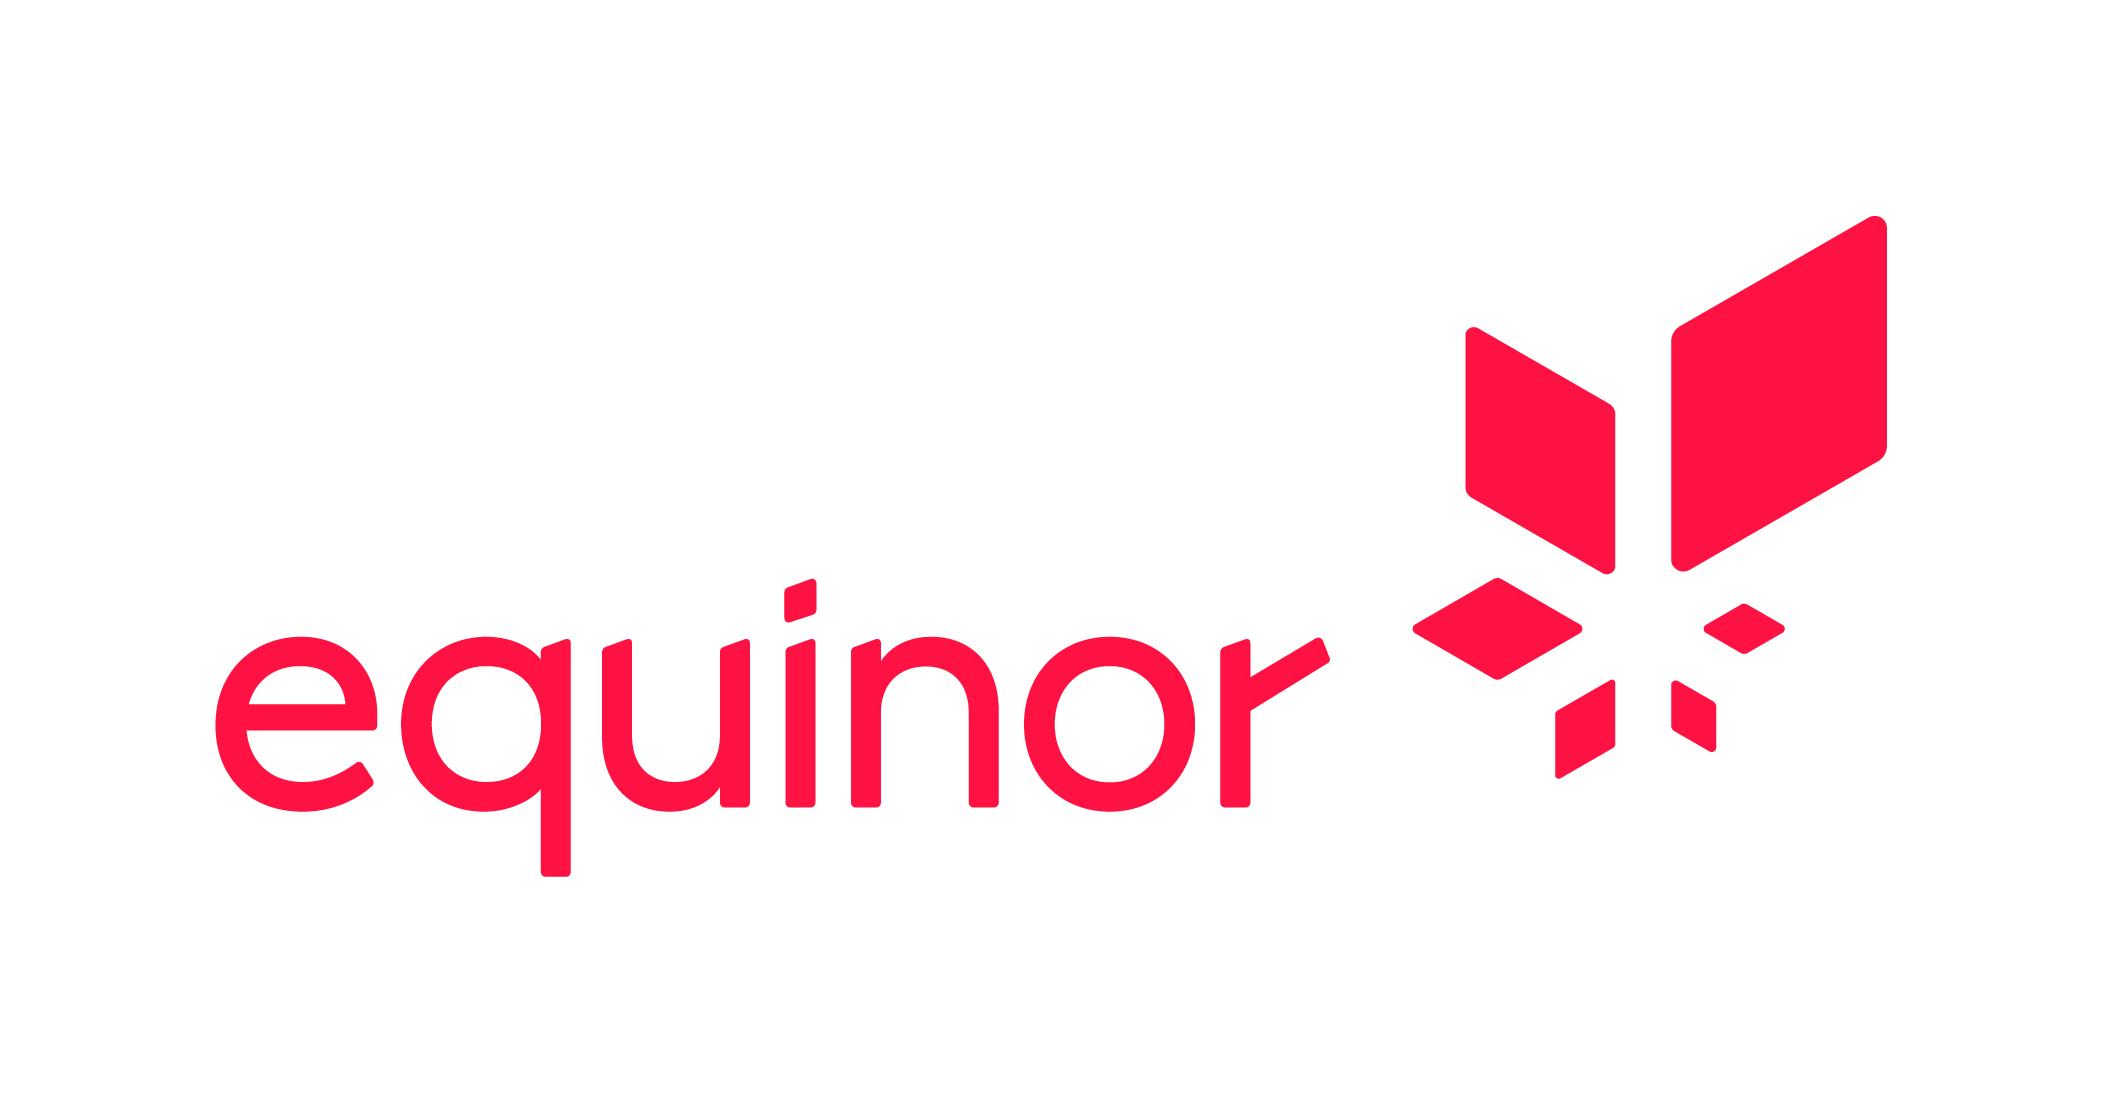 Equinor_HORIZ_logo_RGB_RED.jpg